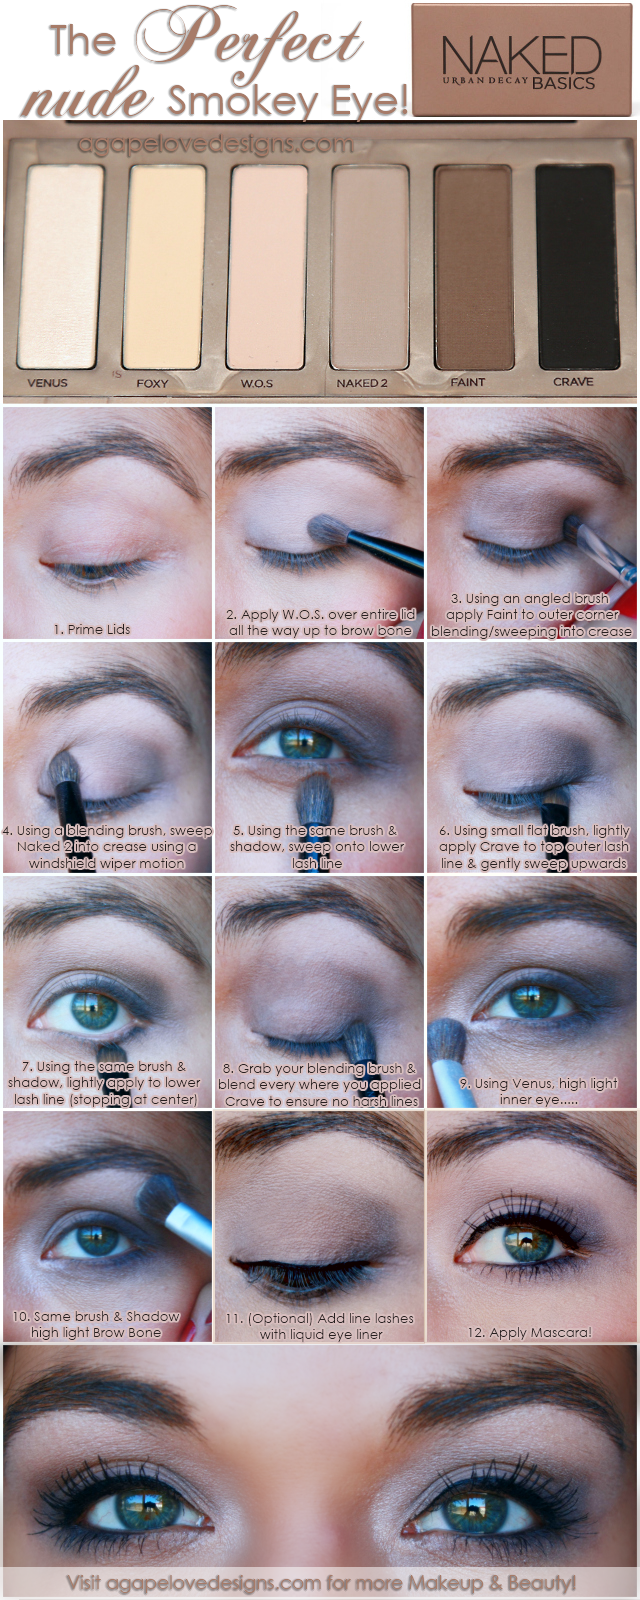 Agape Love Designs: The Perfect Nude Smokey Eye